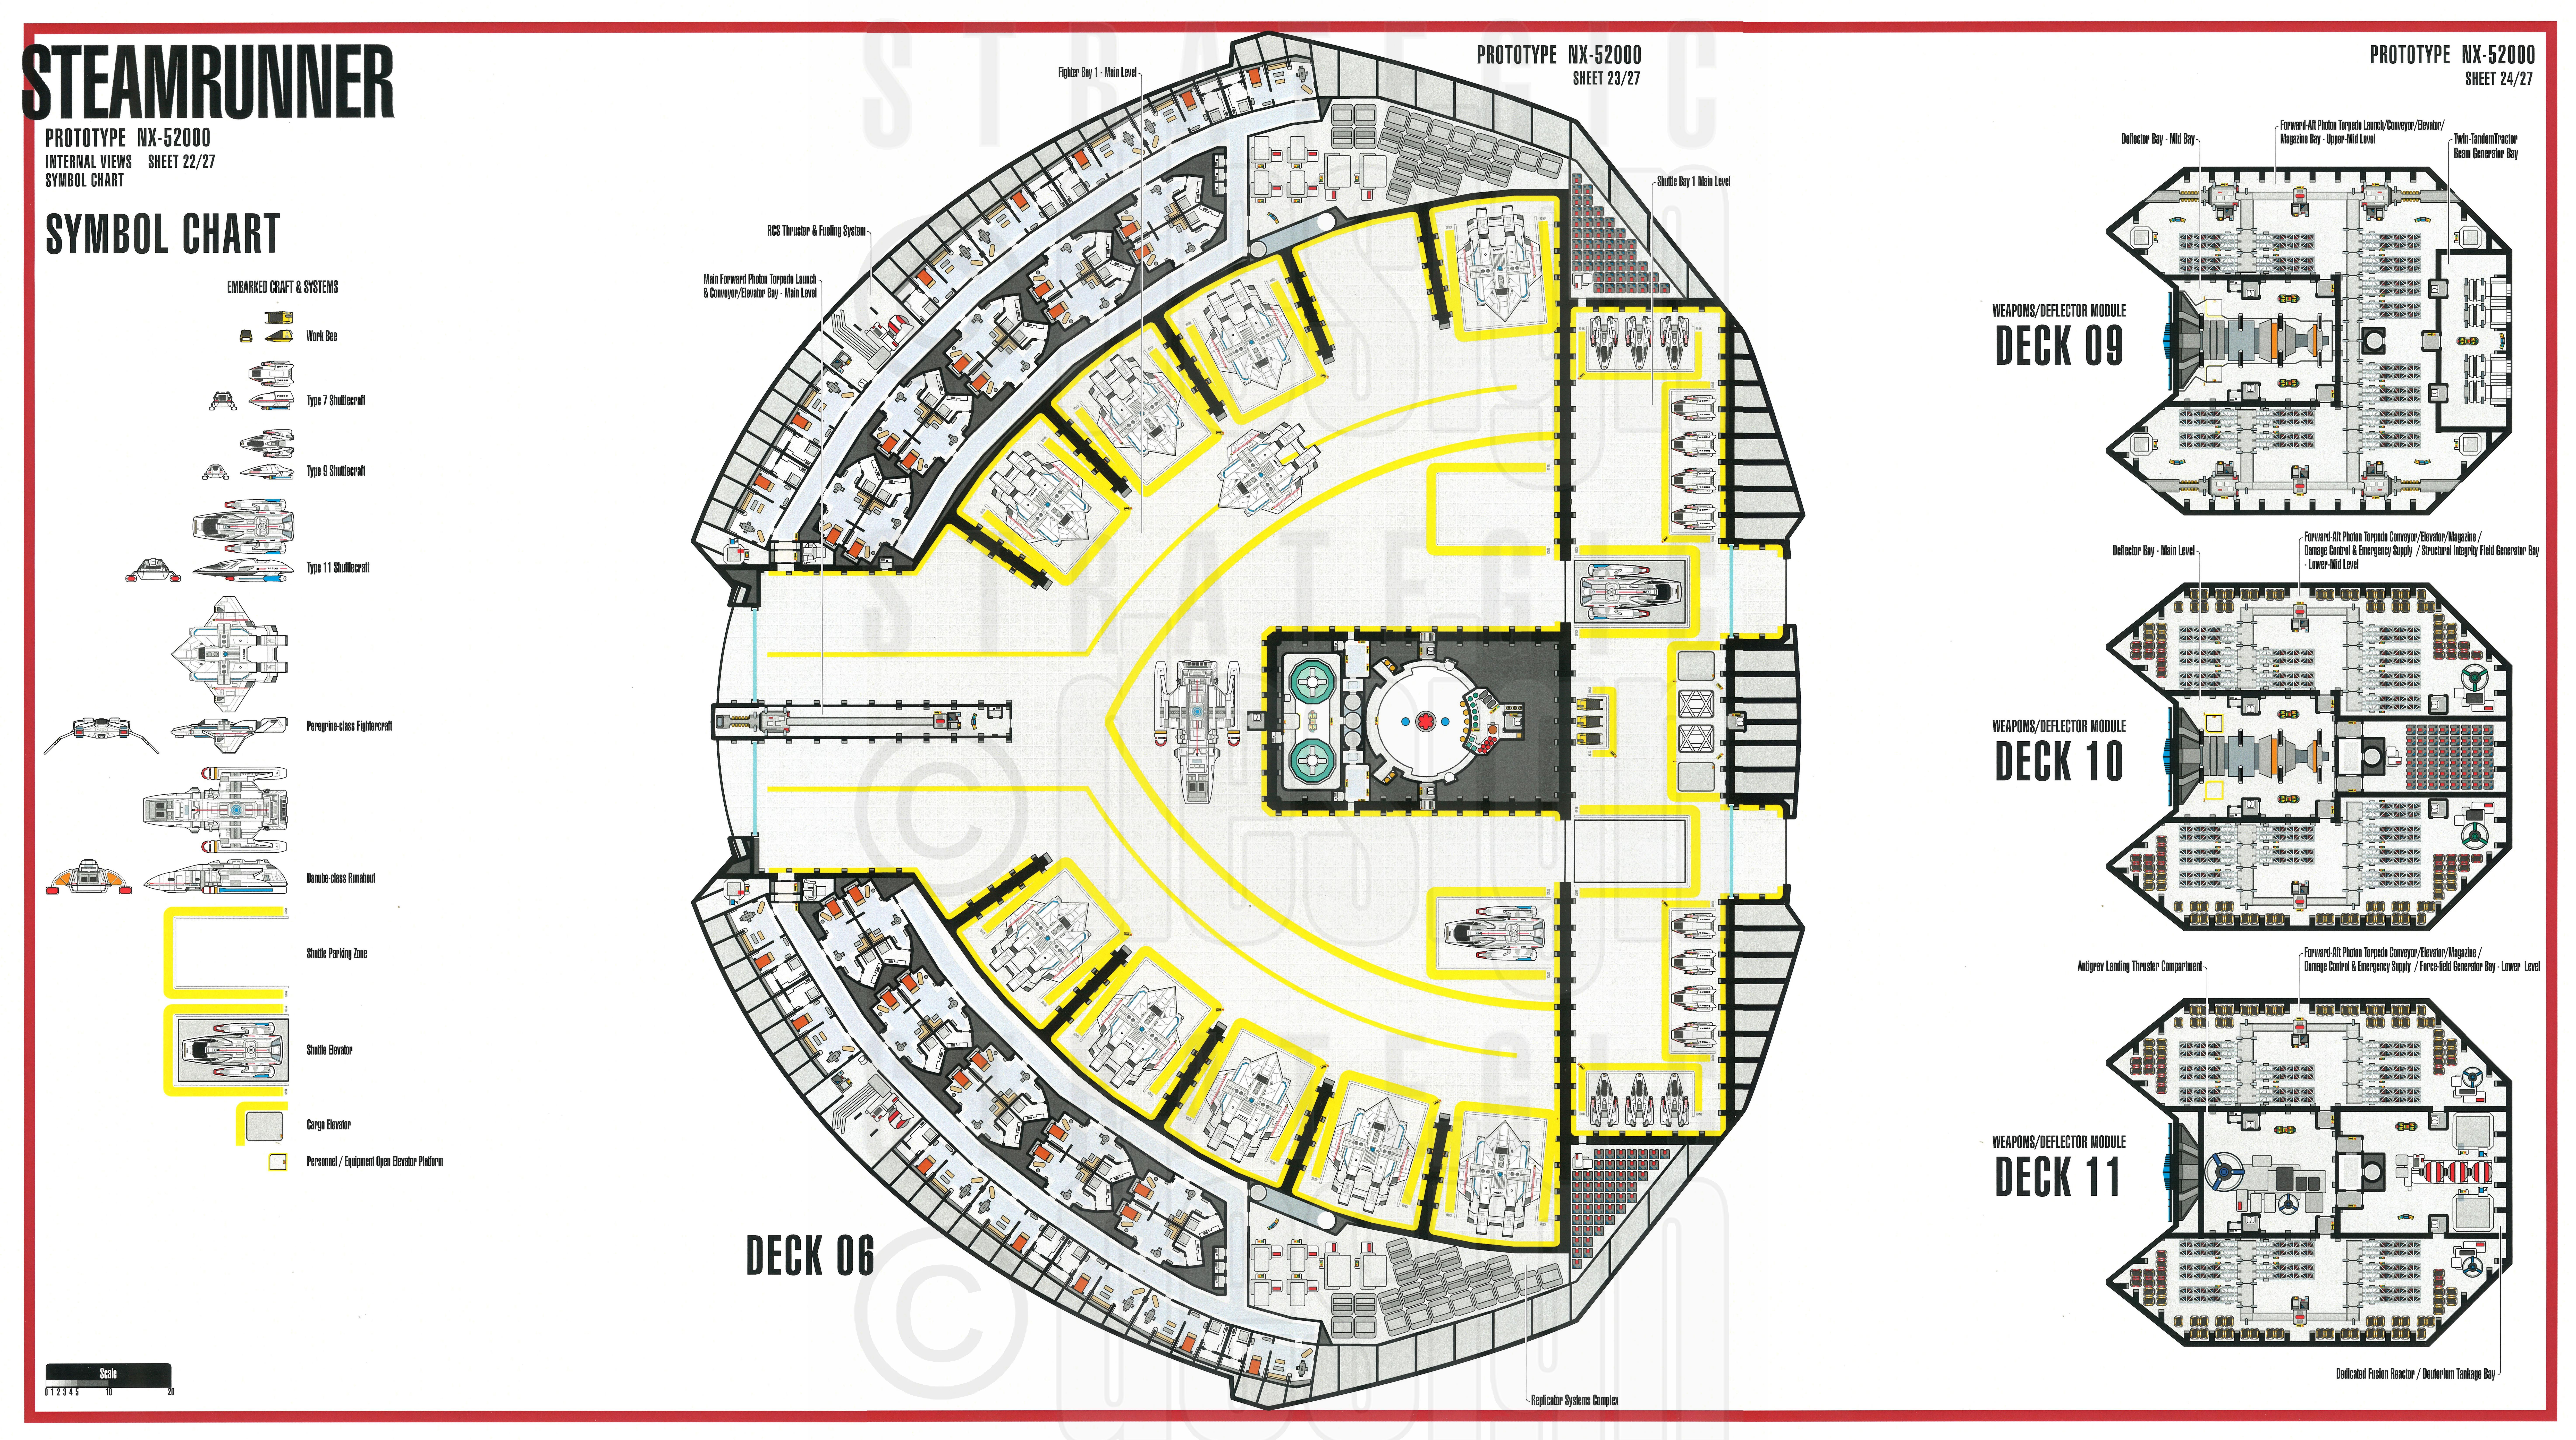 Star trek blueprints steamrunner class starship prototype nx 52000 sheets 22 24 deck 06 deck 09 deck 10 deck 11 symbol chart malvernweather Images